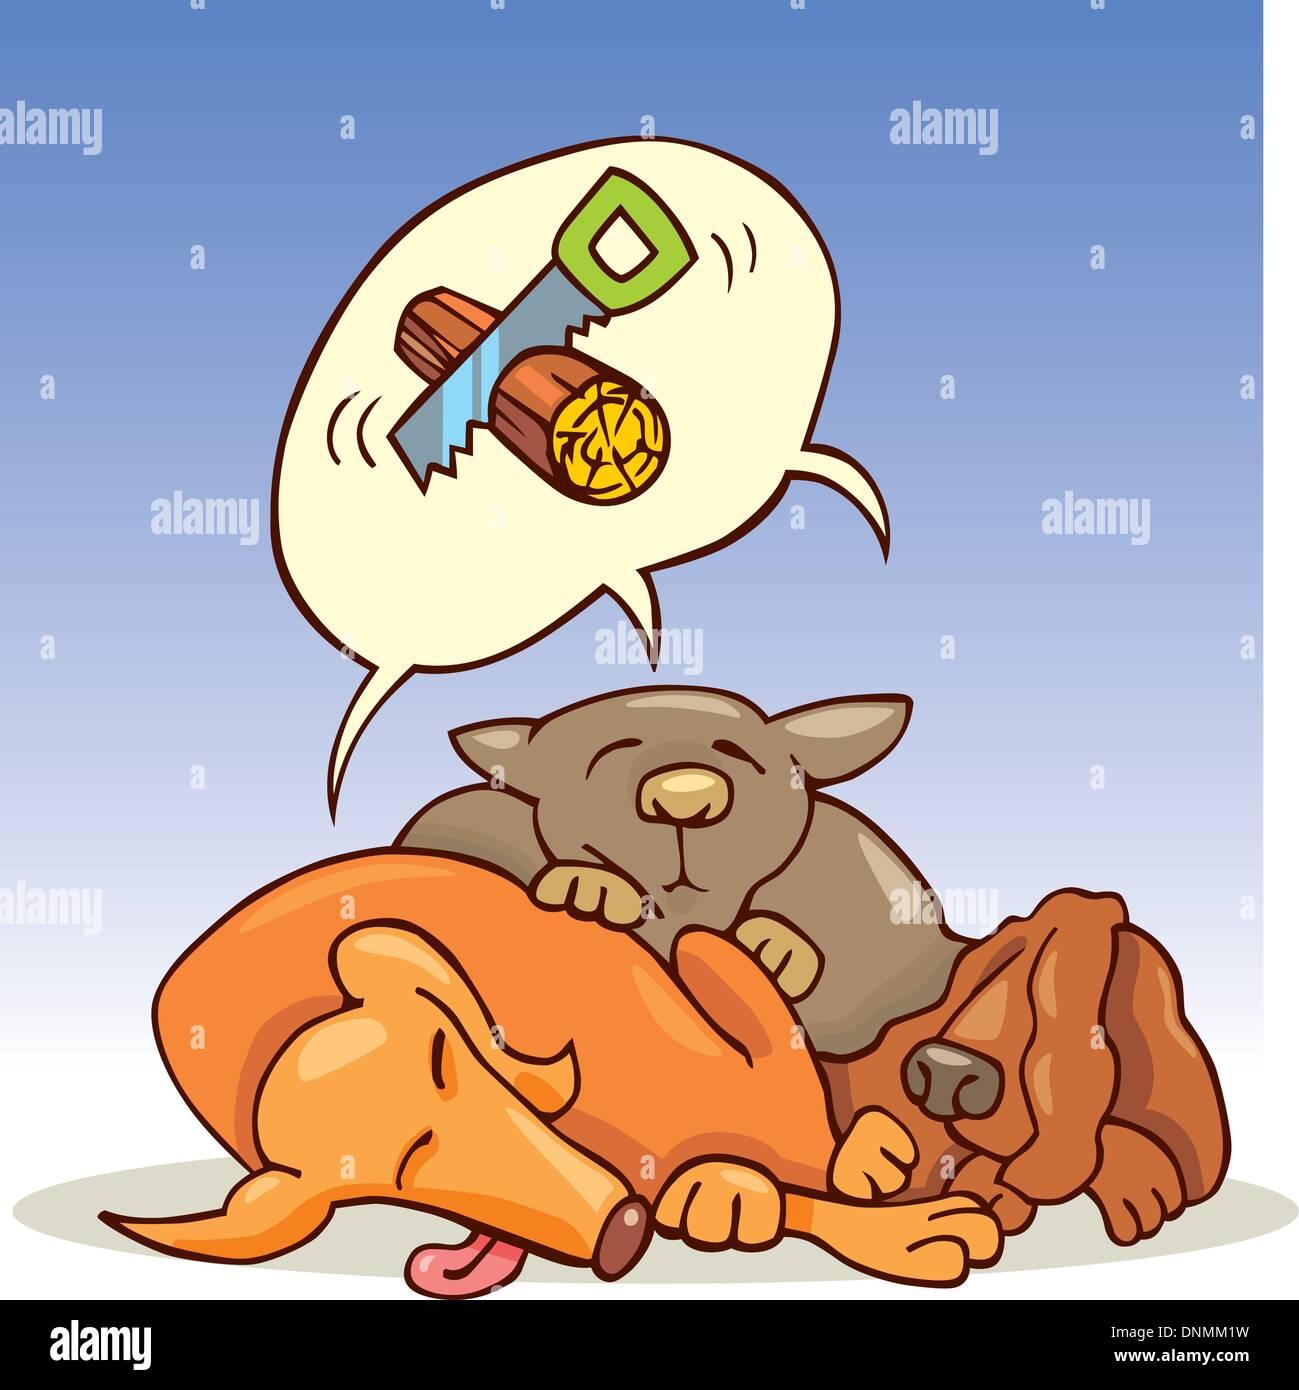 Cartoon illustration of three dogs sleeping - Stock Vector